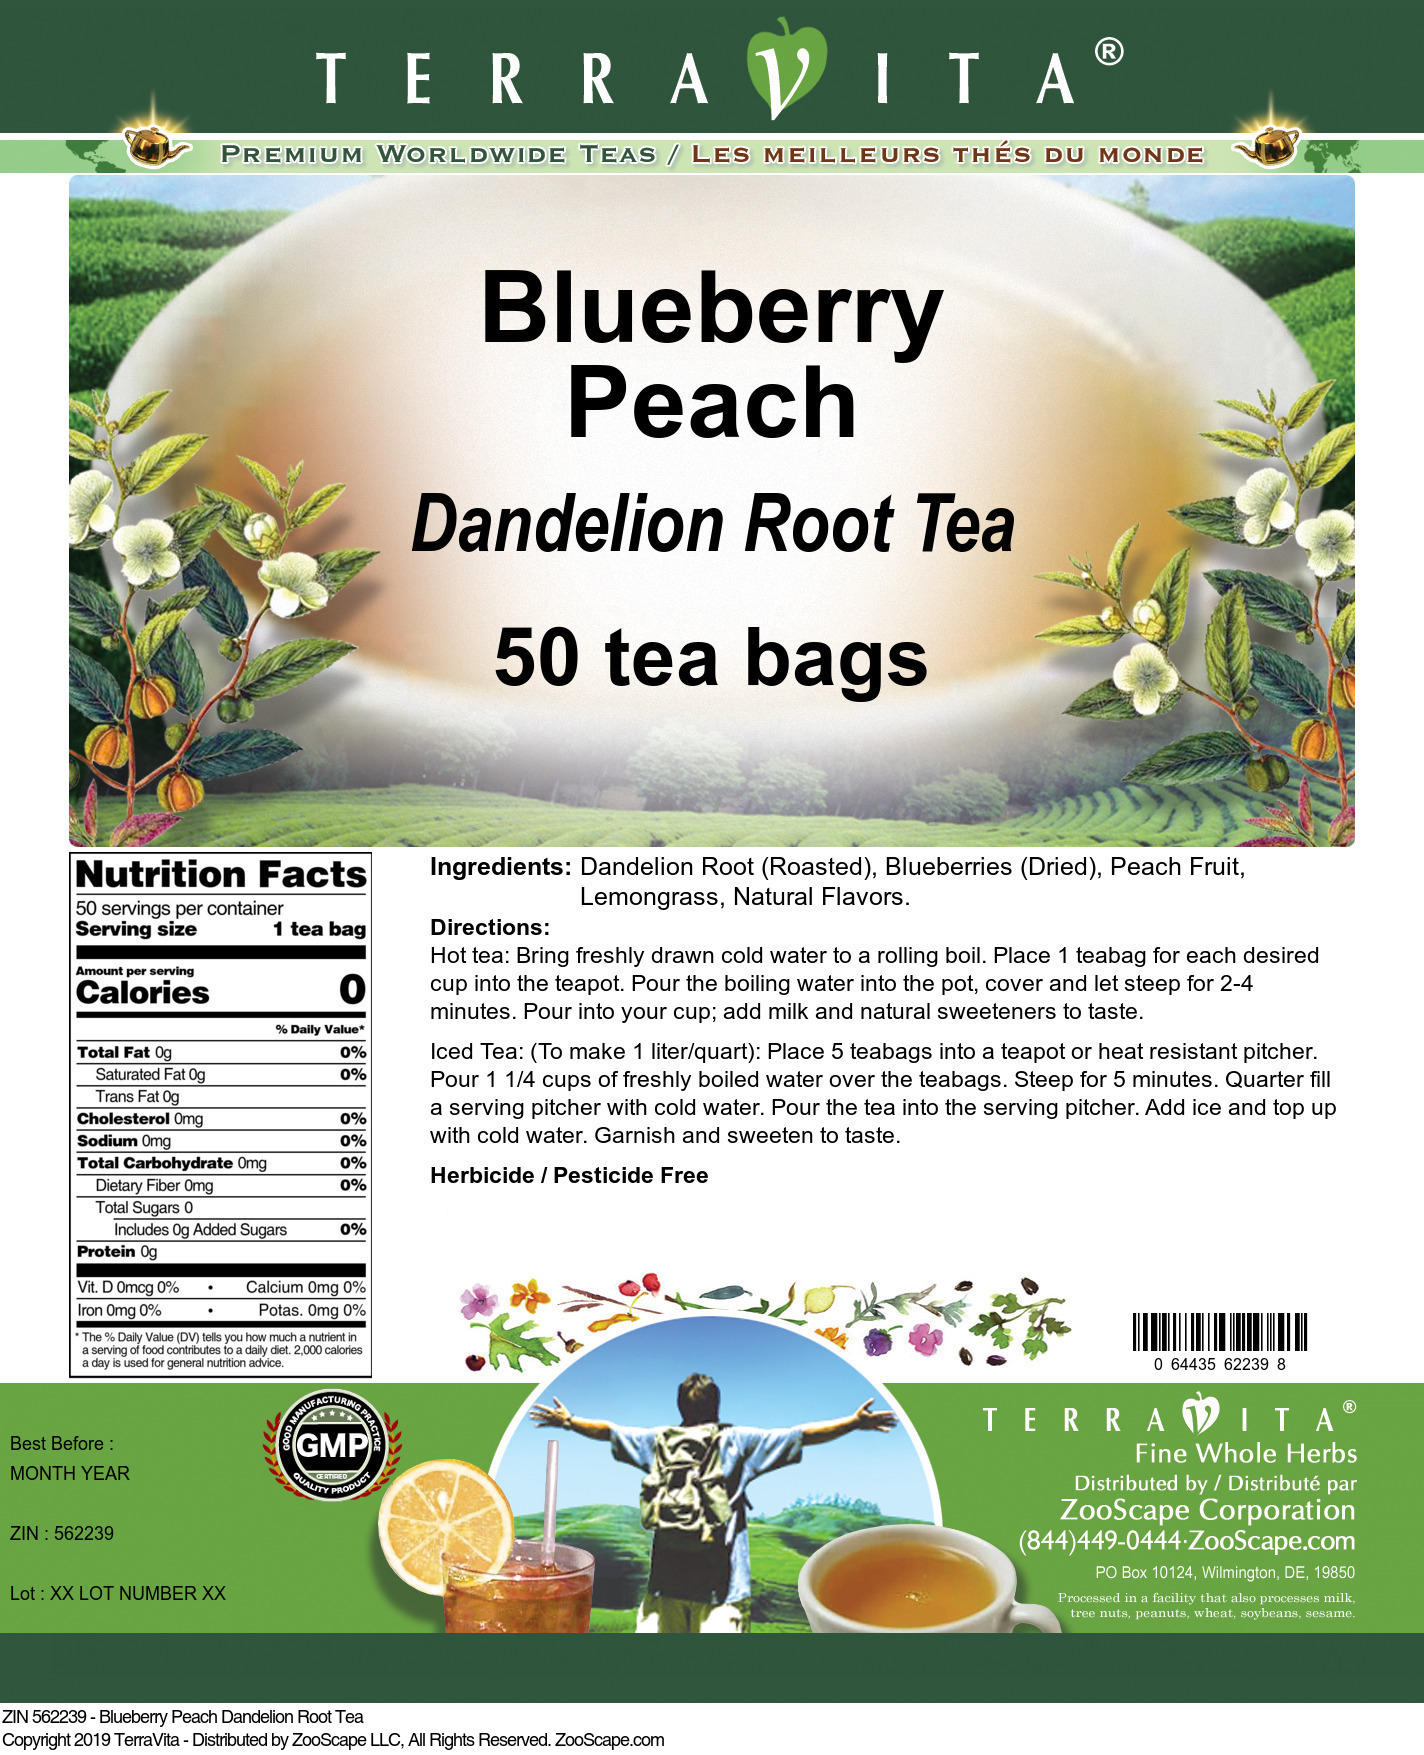 Blueberry Peach Dandelion Root Tea